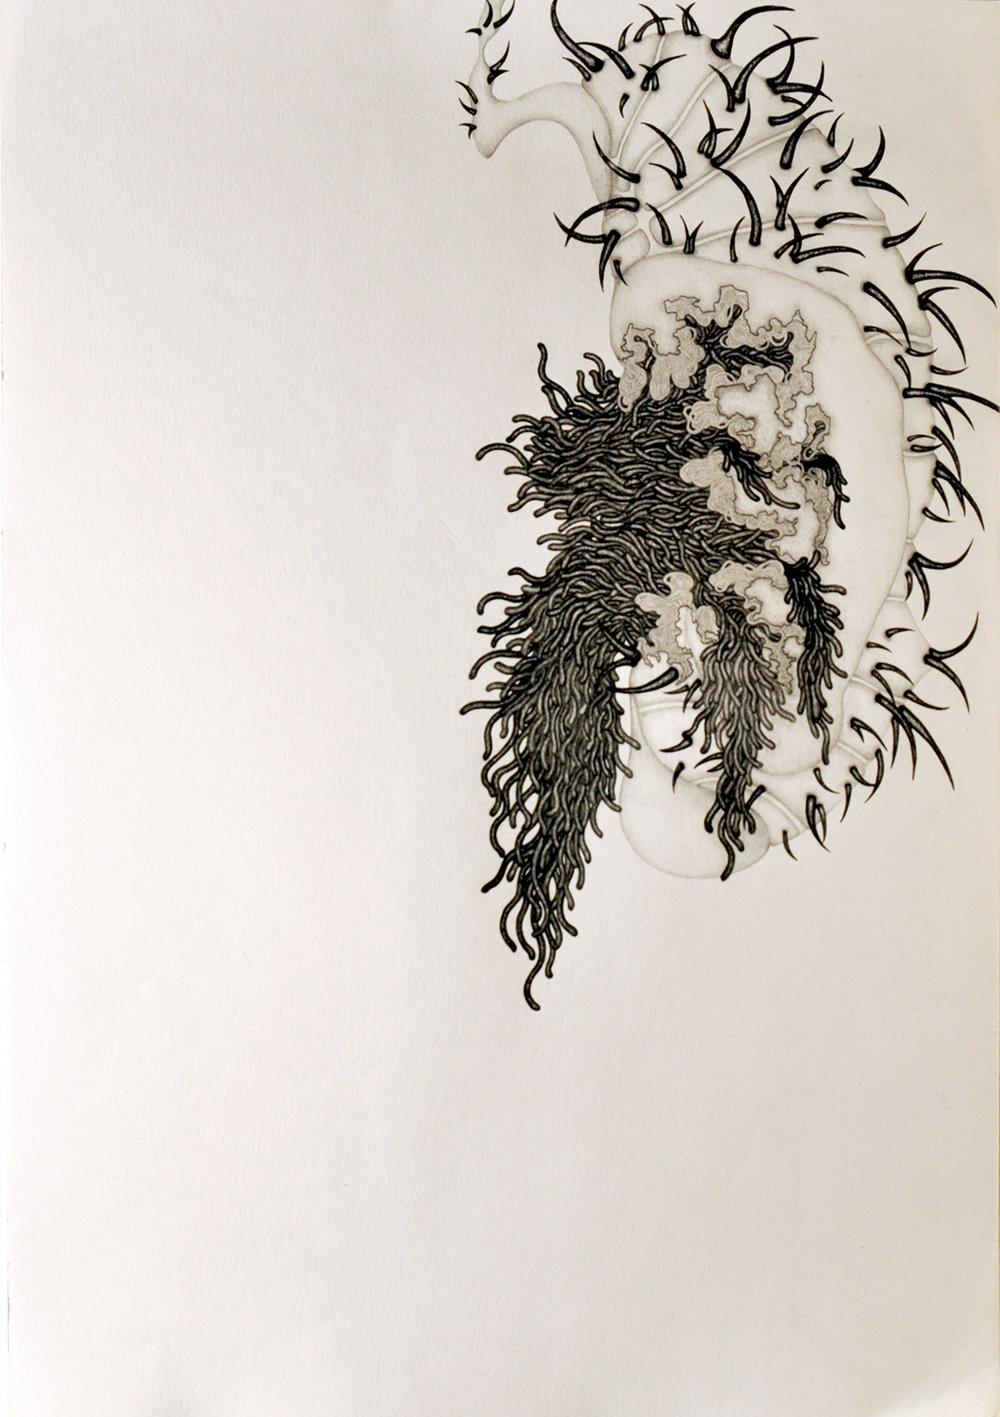 Chrysalis 004,  2013. 50cmx35cm. Pencil on Fabriano paper.